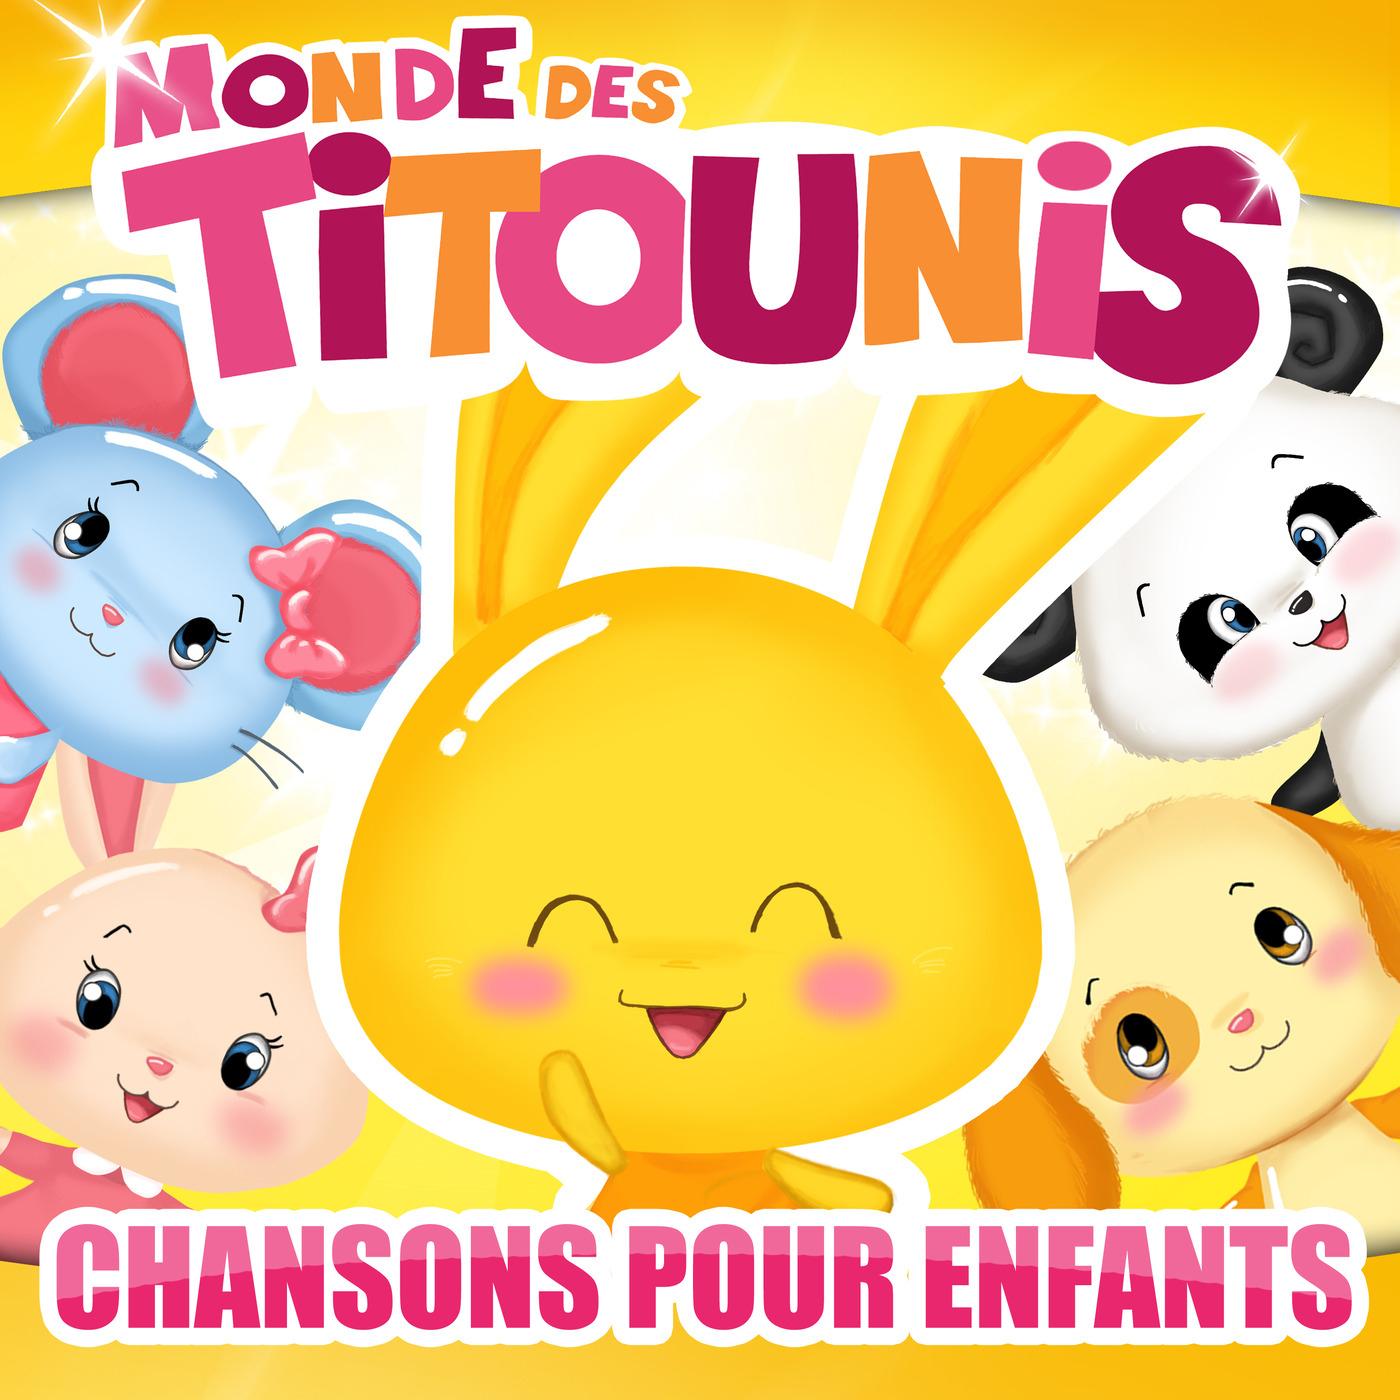 Listen Free To Monde Des Titounis - Tourne Tourne Petit dedans Petit Moulin Chanson